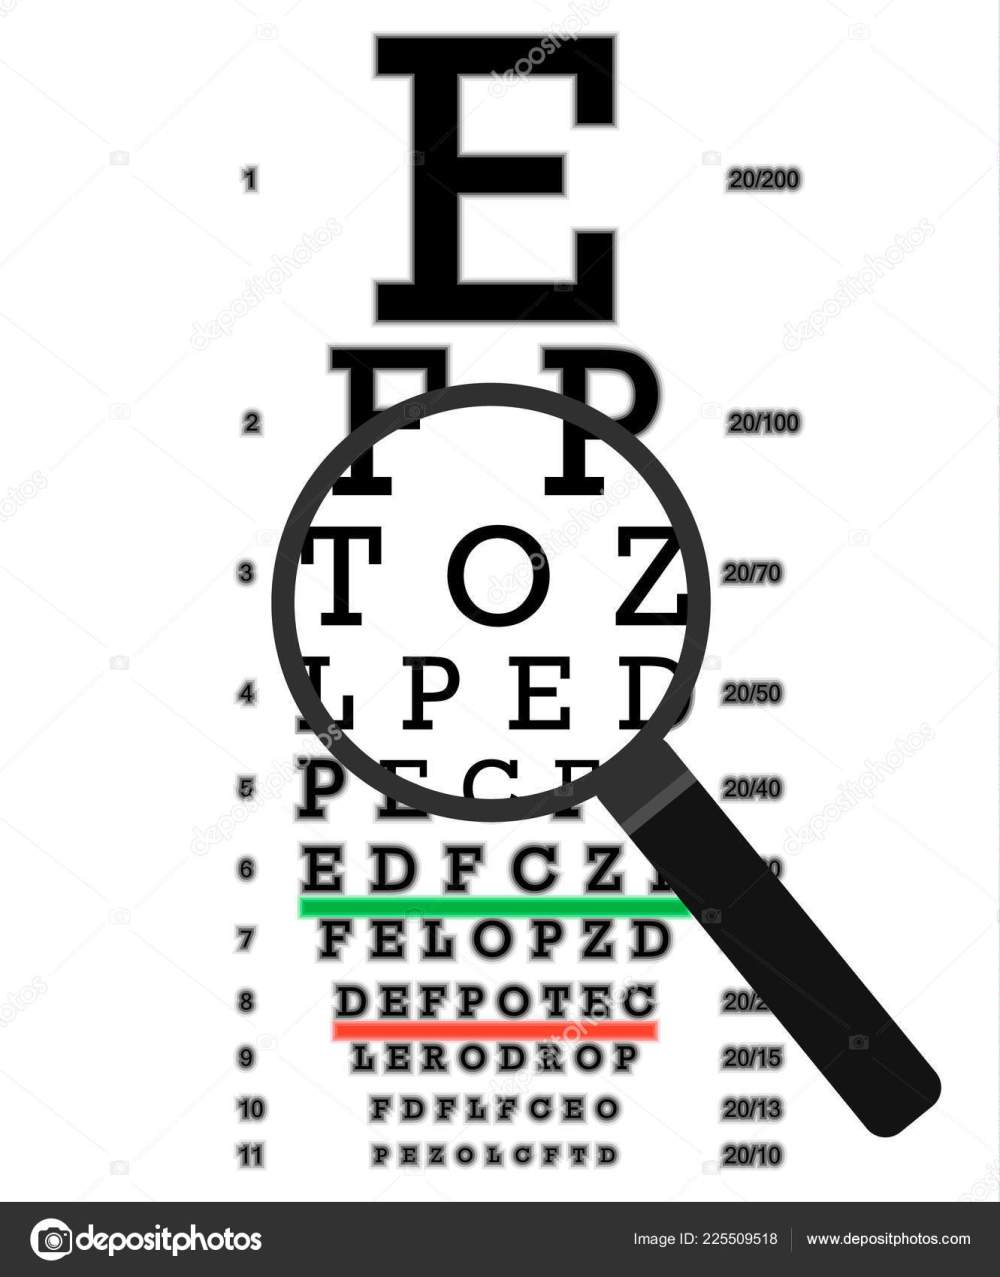 medium resolution of eye vision test poor eyesight myopia diagnostic on snellen eye test chart vision correction